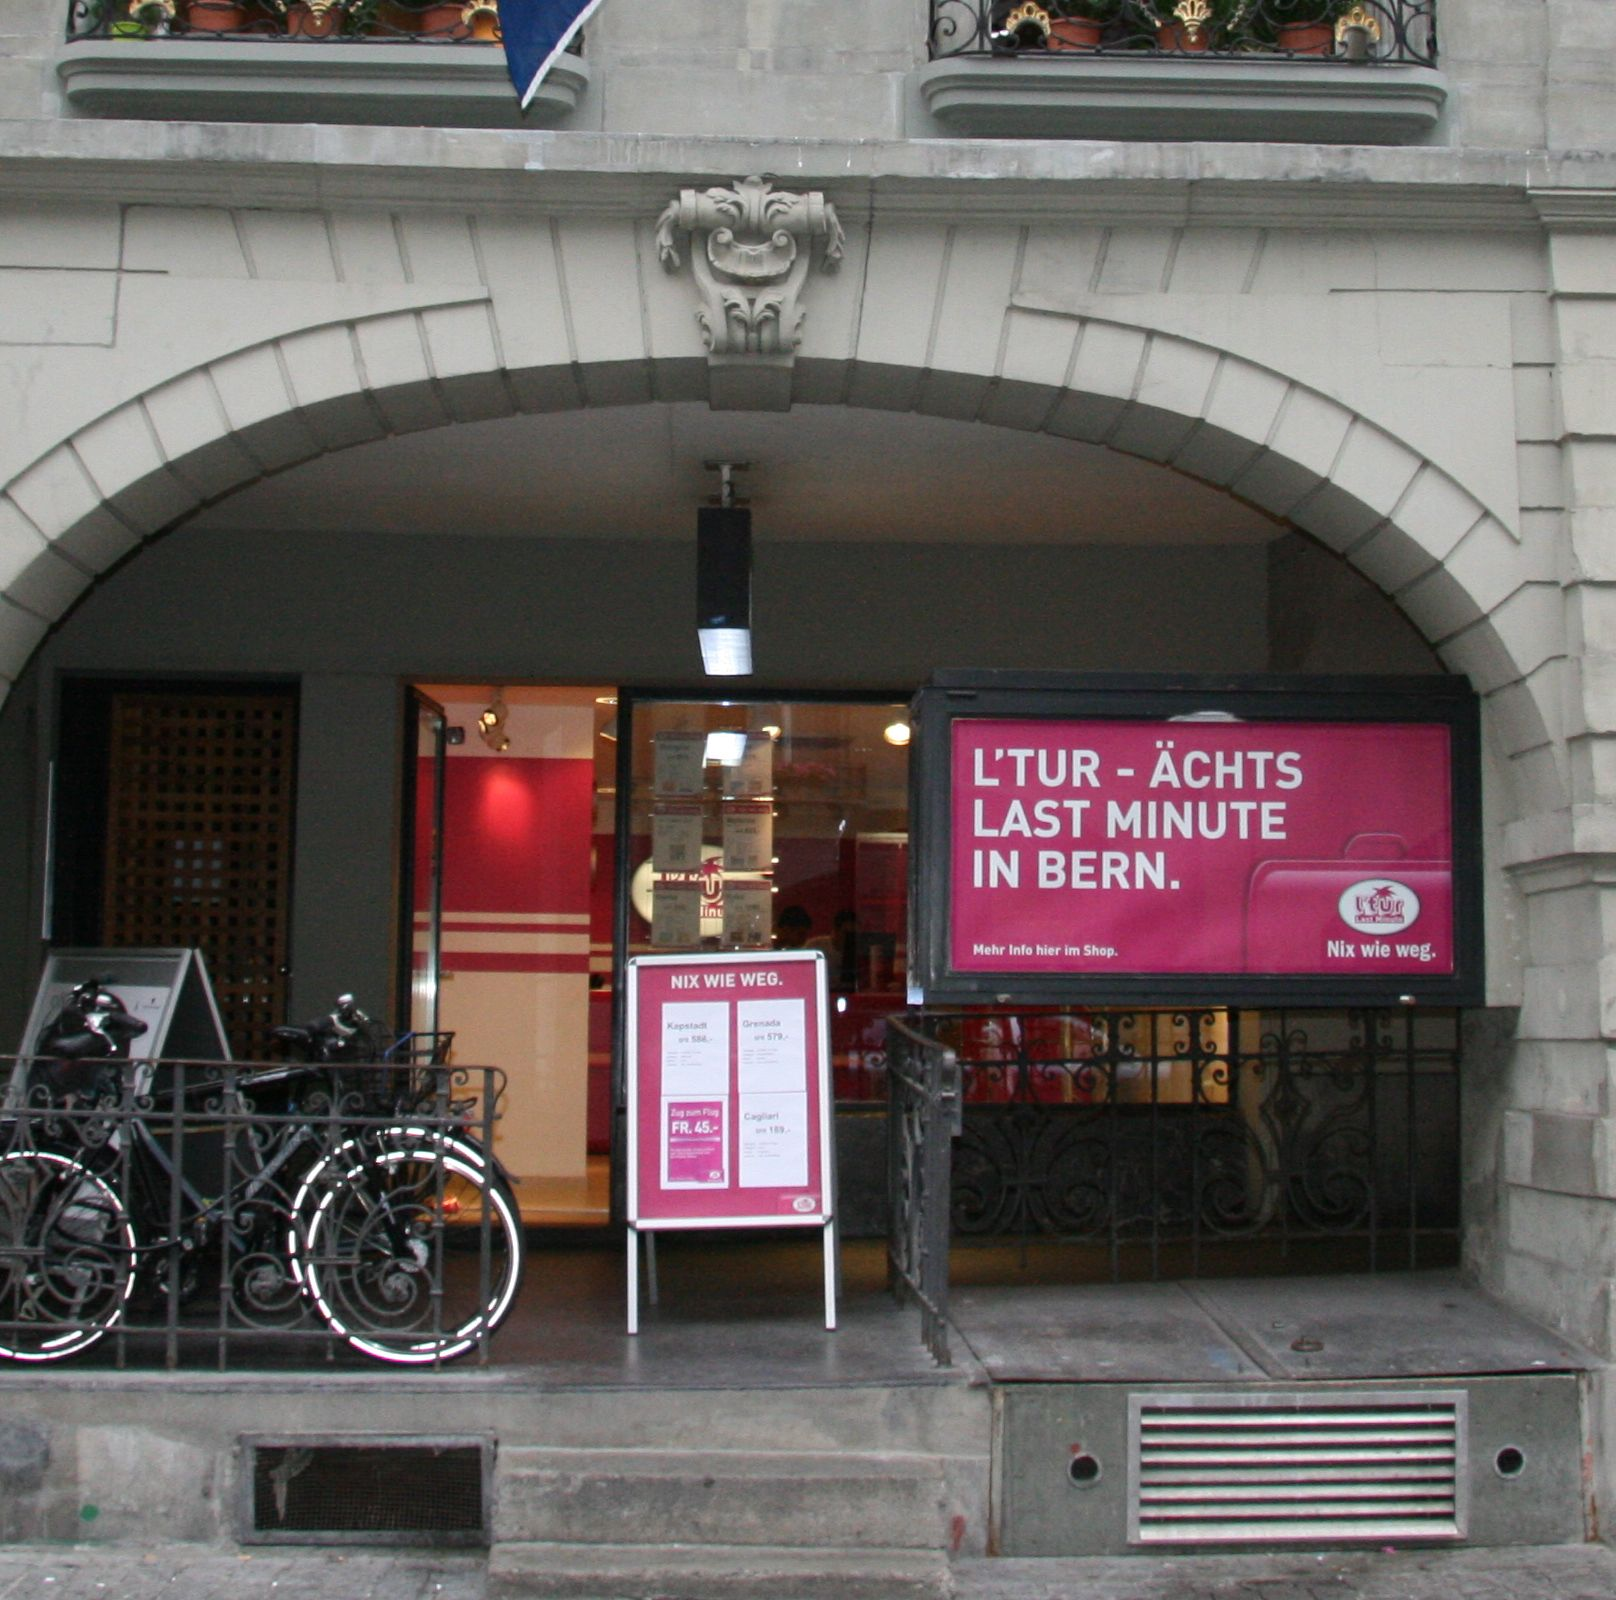 l'tur Reisebüro Bern